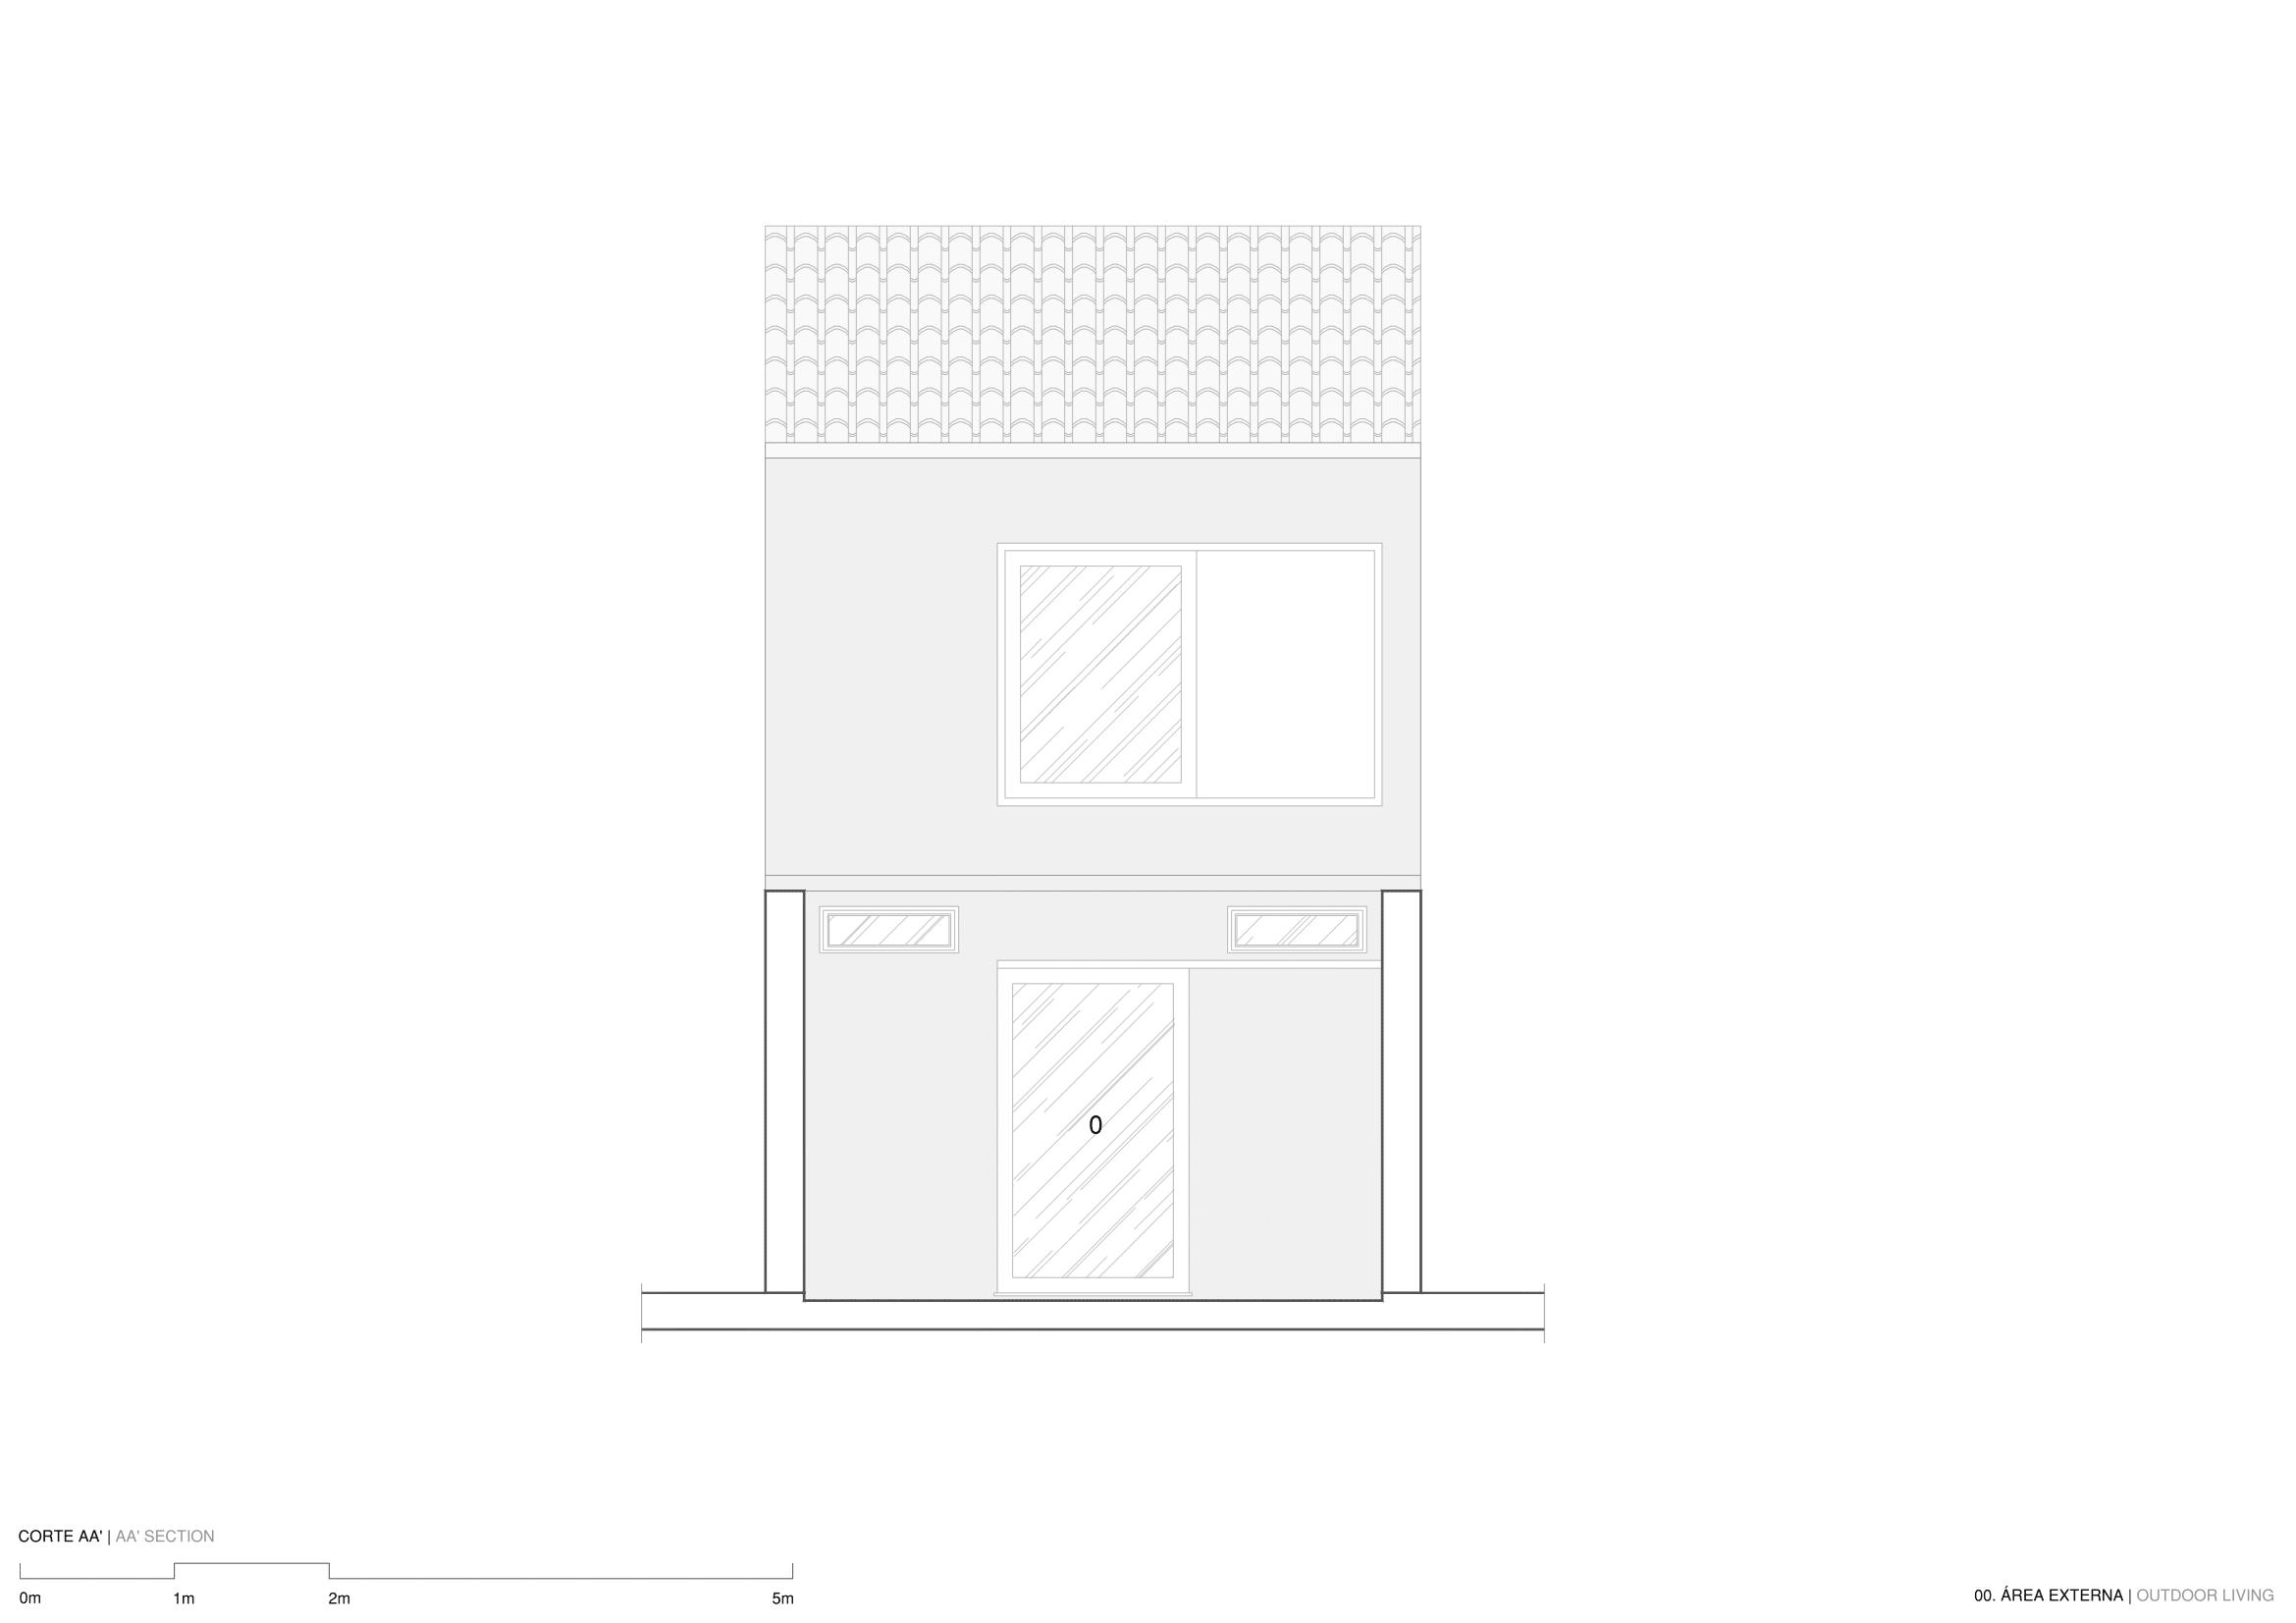 hobjeto-arquitetura-produtora-velloni-ap-04-corteaa